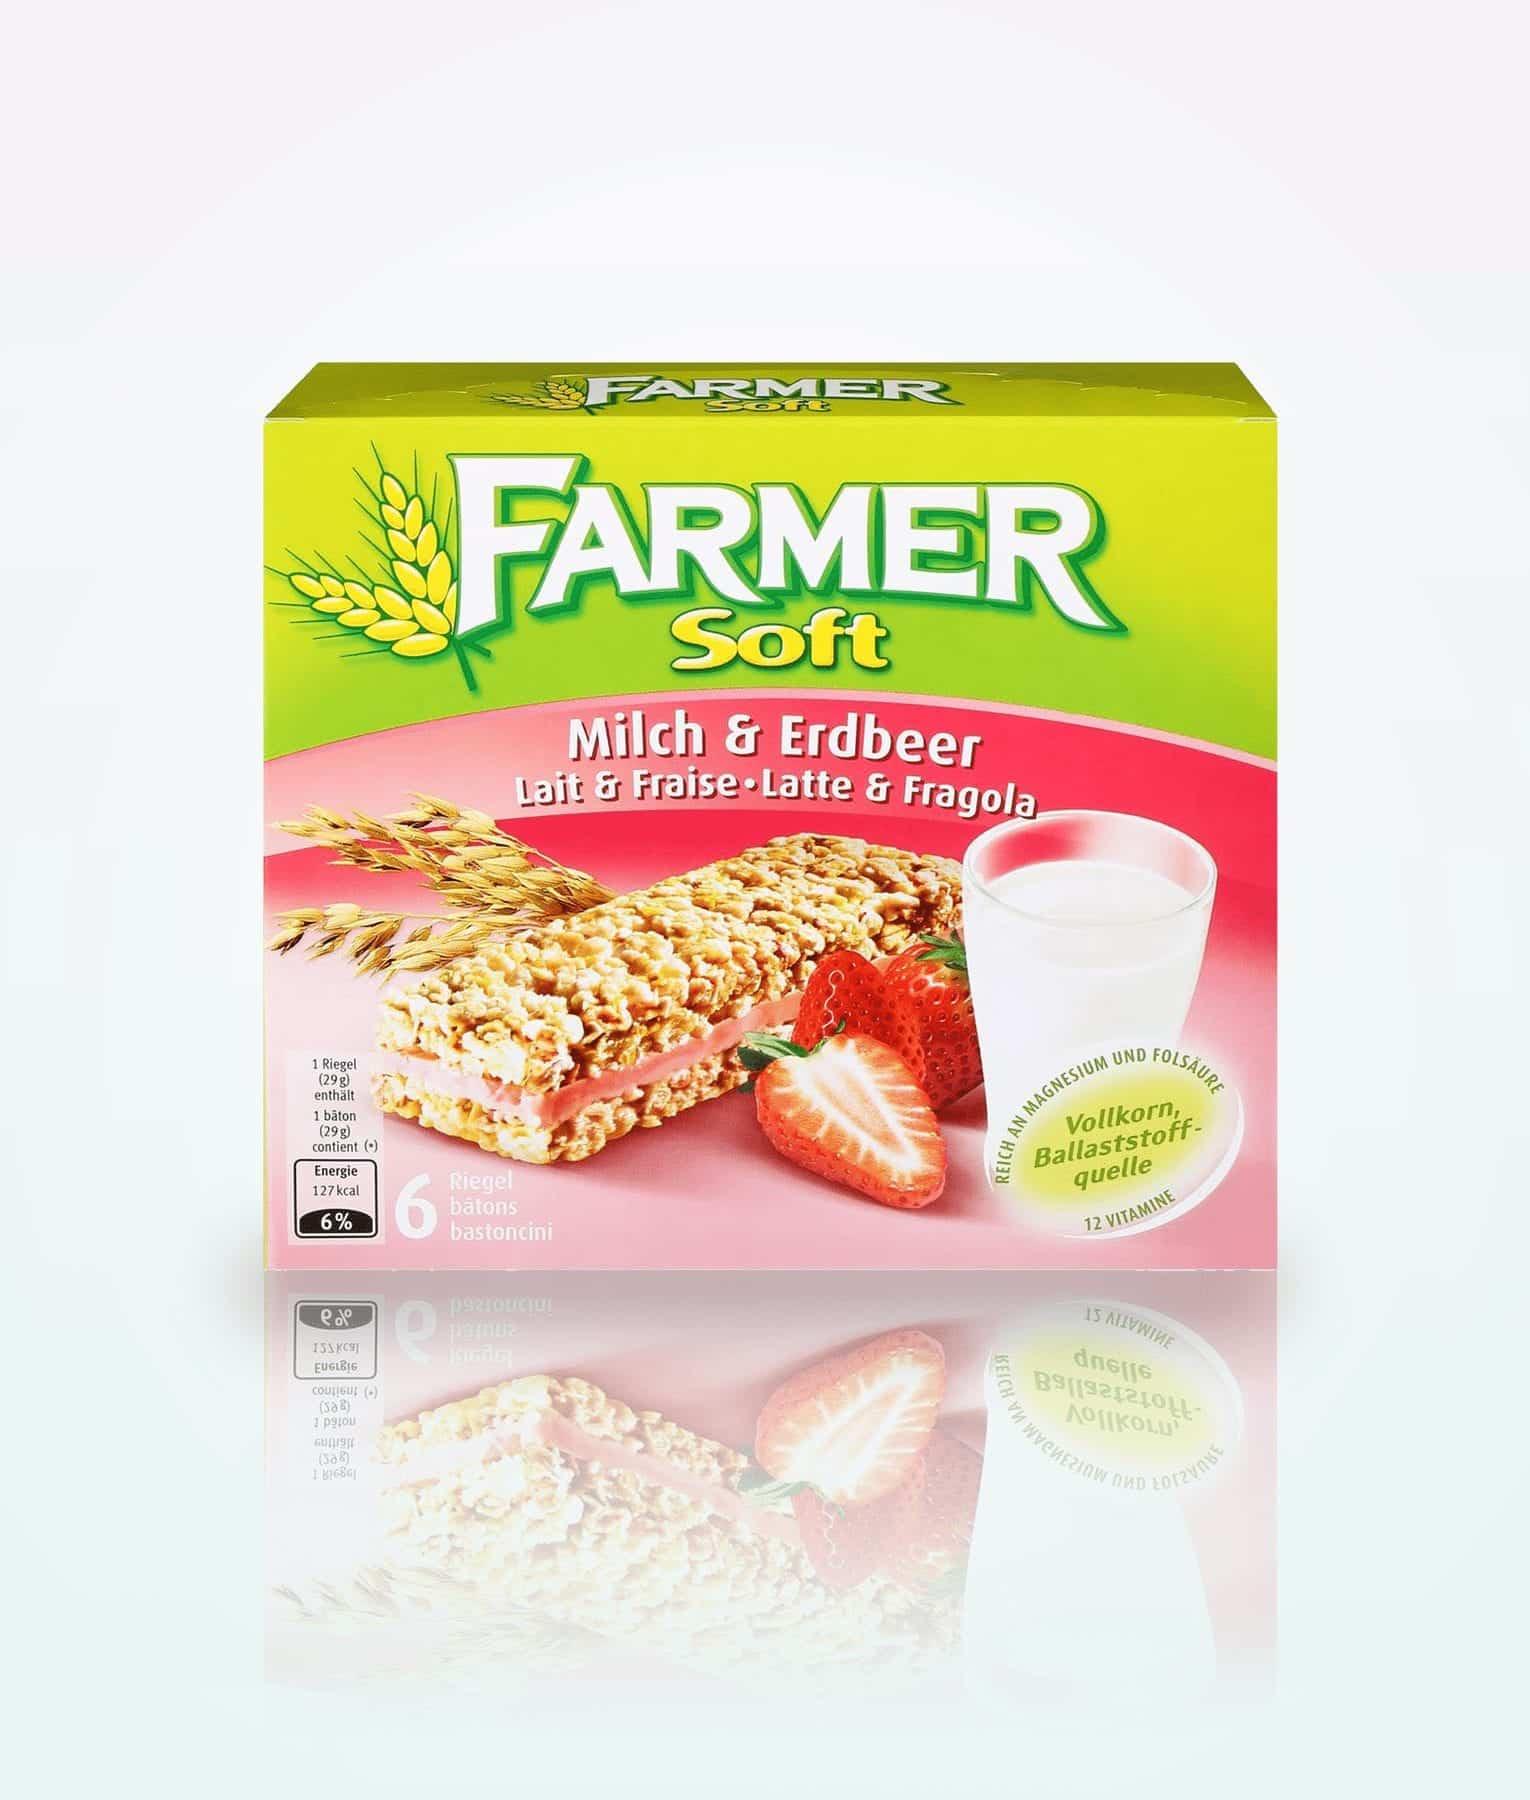 farmer-6-soft-milk-strawberry-bars